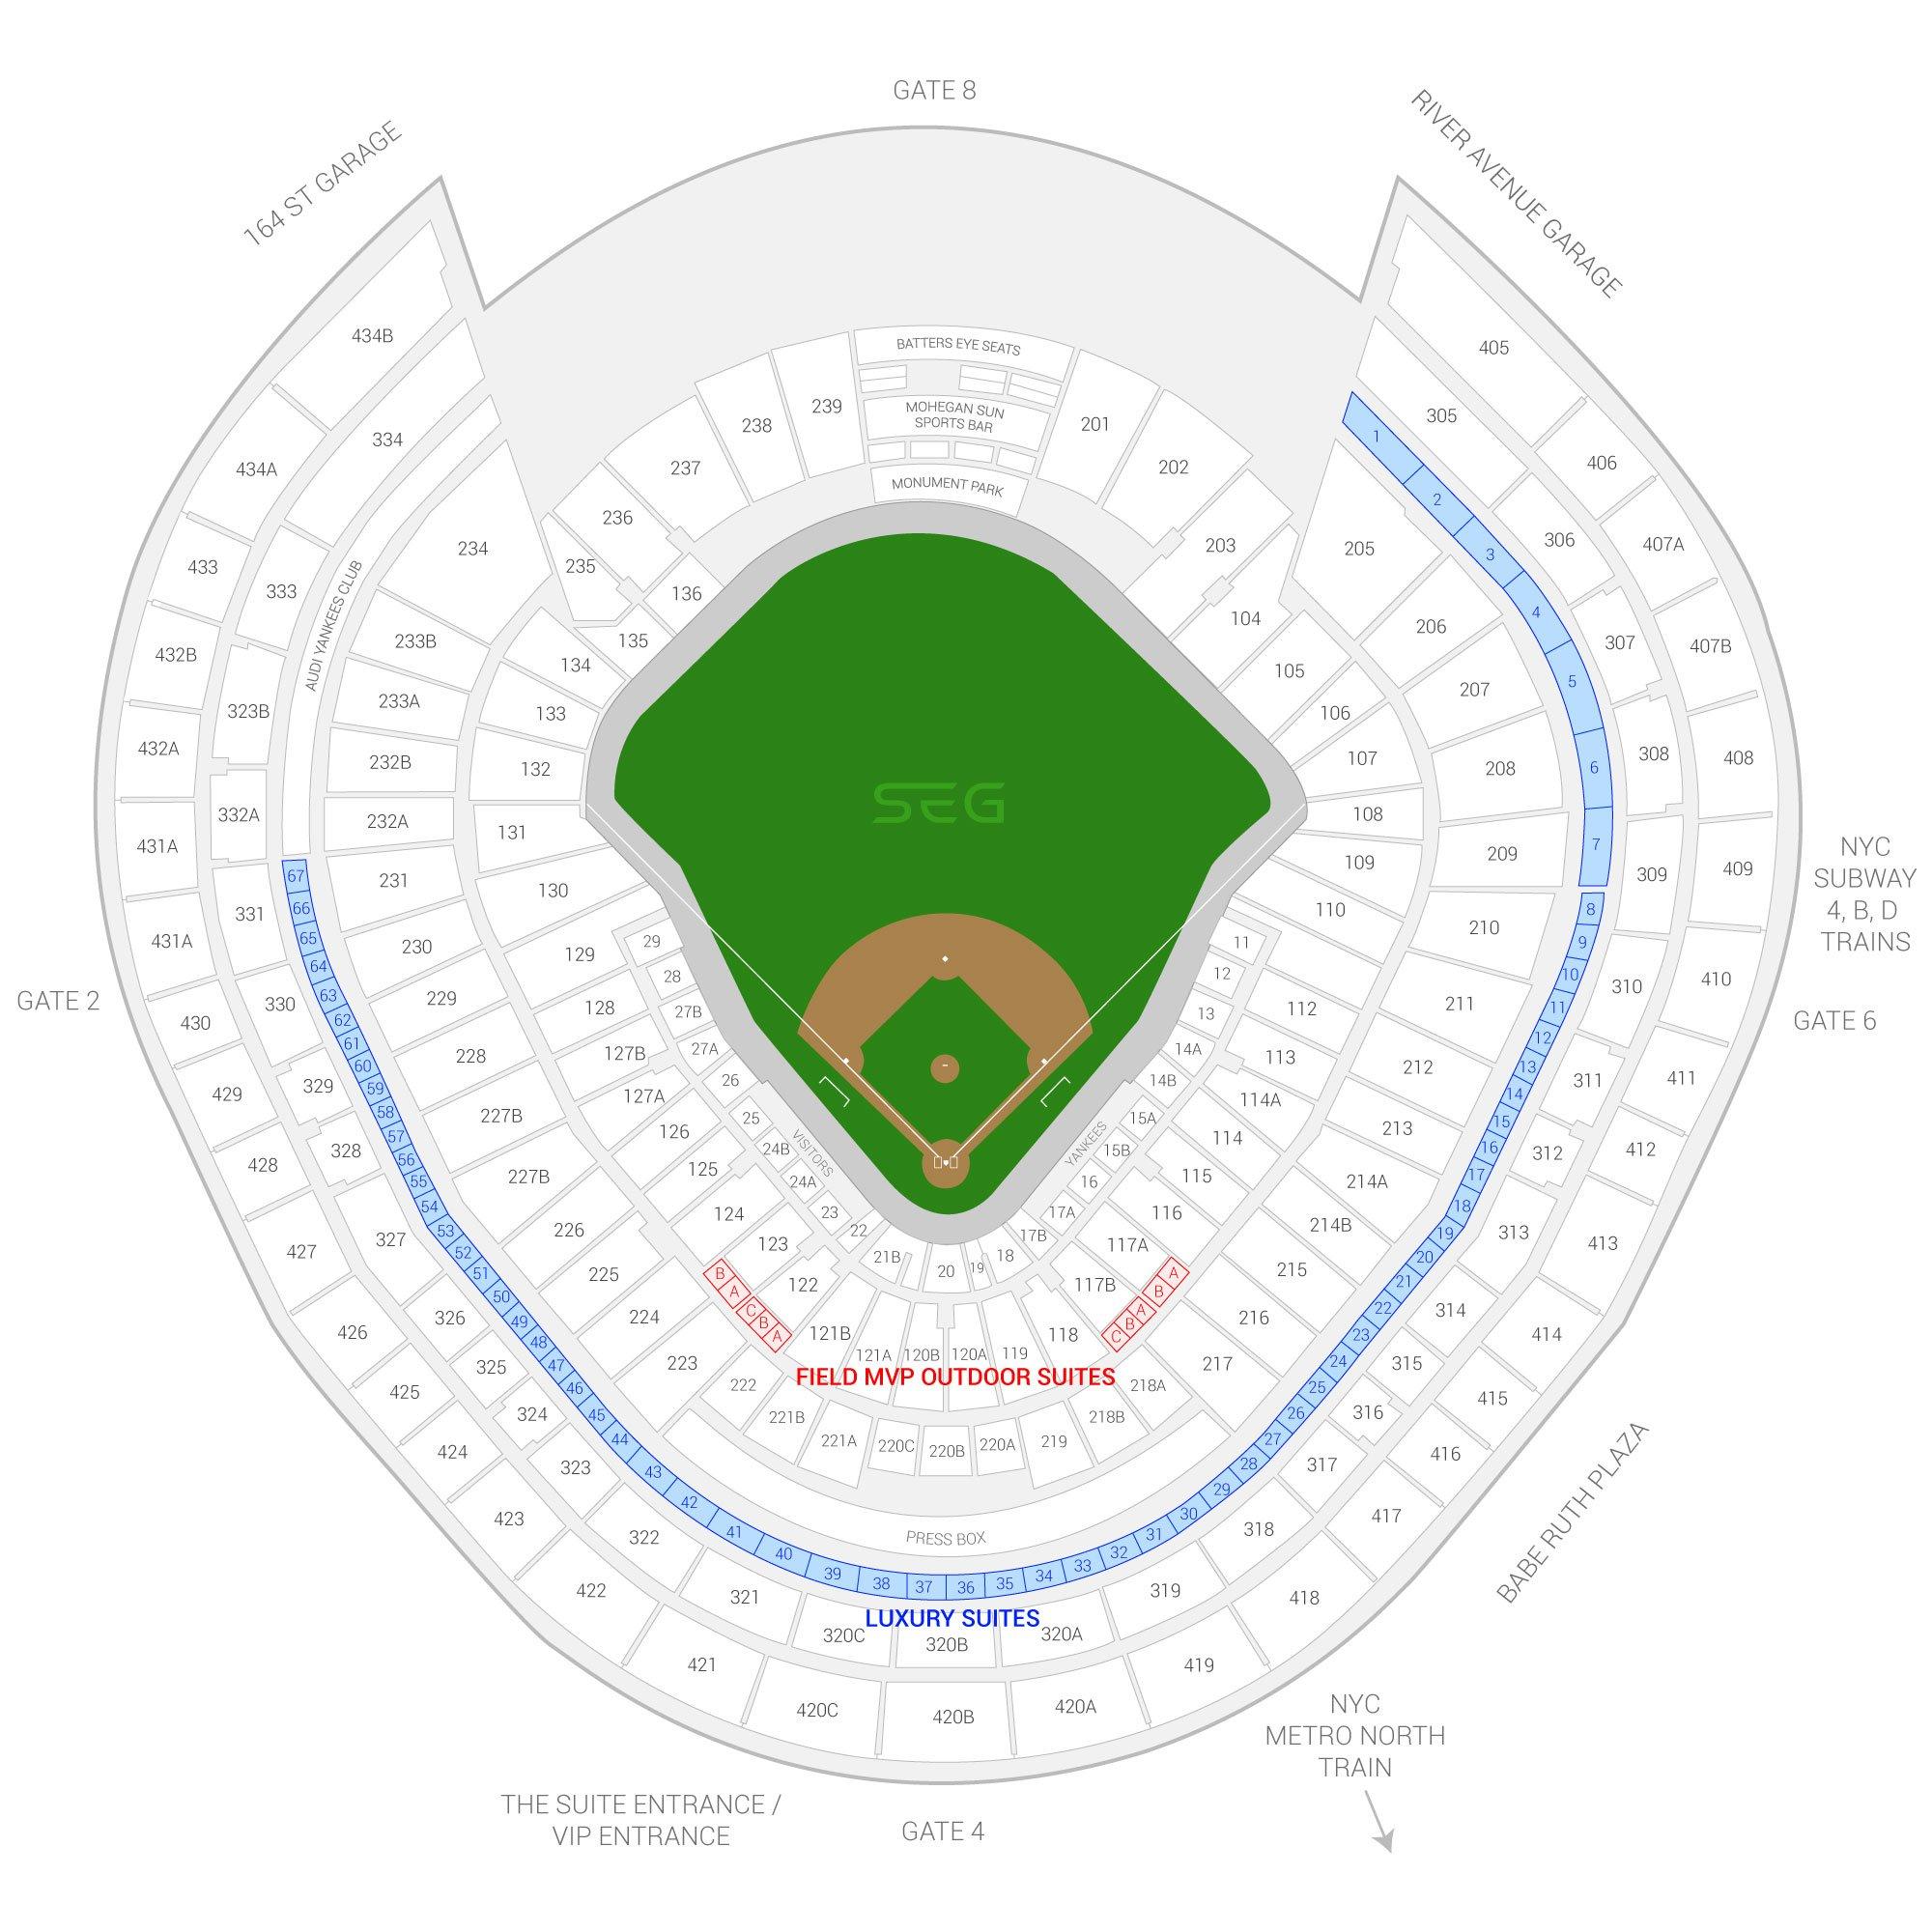 Yankee Stadium / New York Yankees Suite Map and Seating Chart